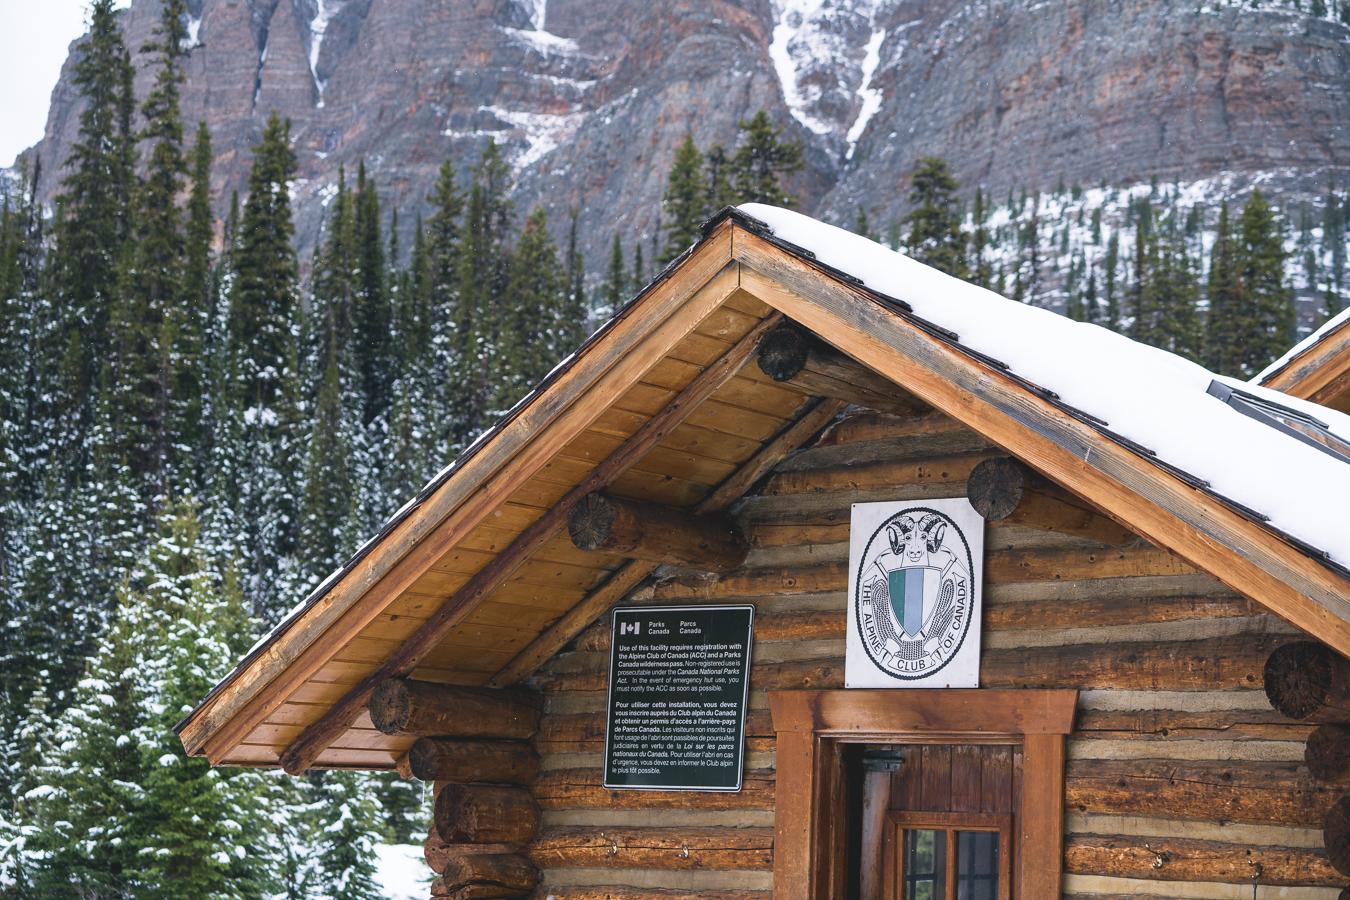 Servicing the Elizabeth Park Hut, a coveted hut for ski touring!